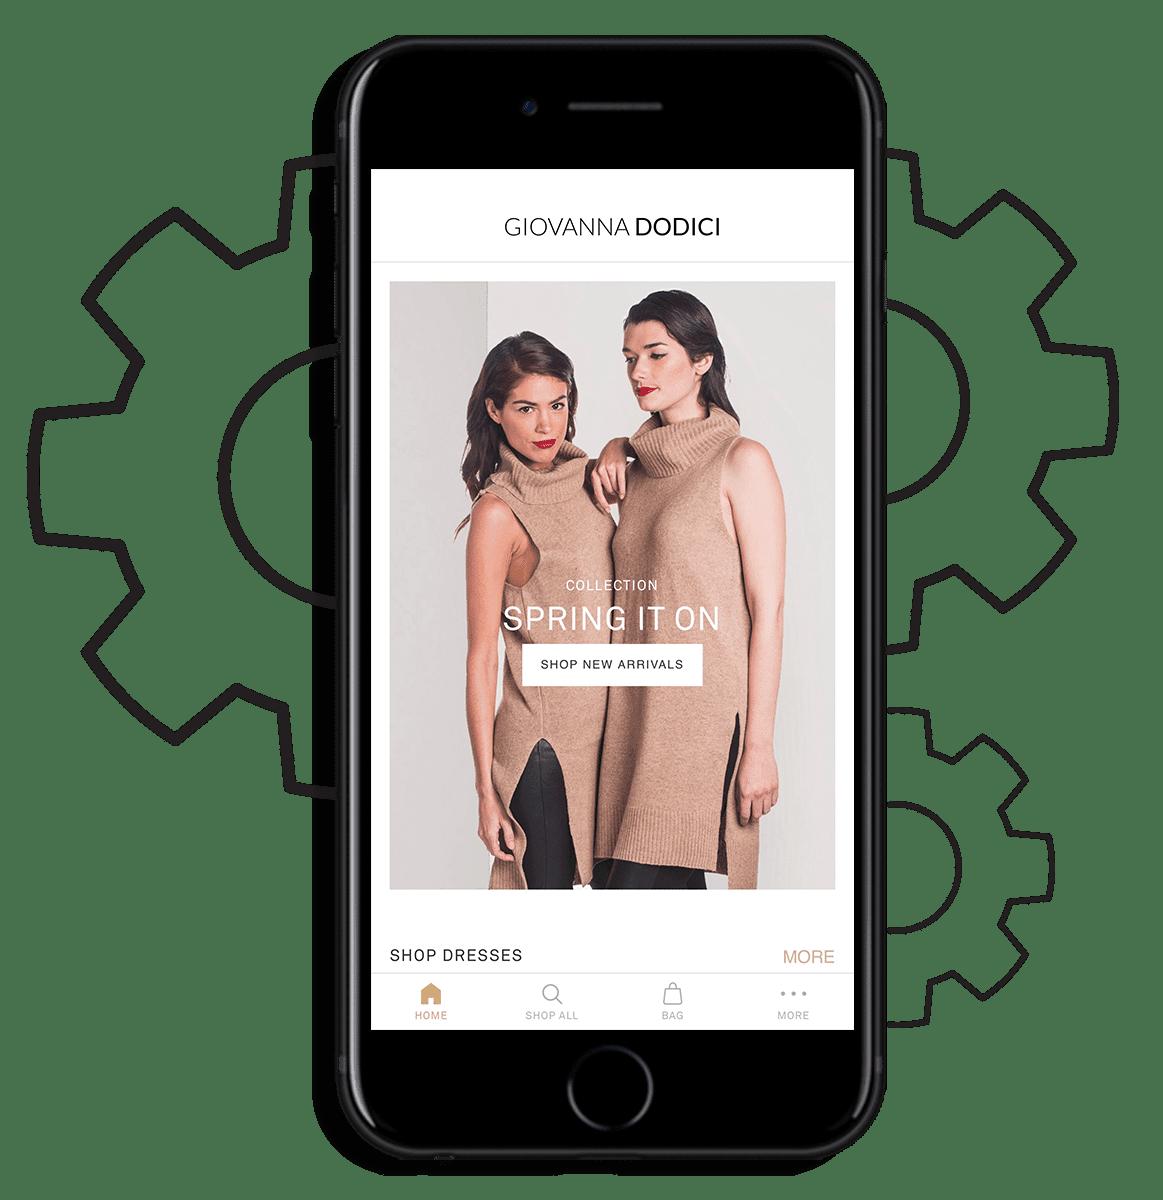 iphone showing online store app